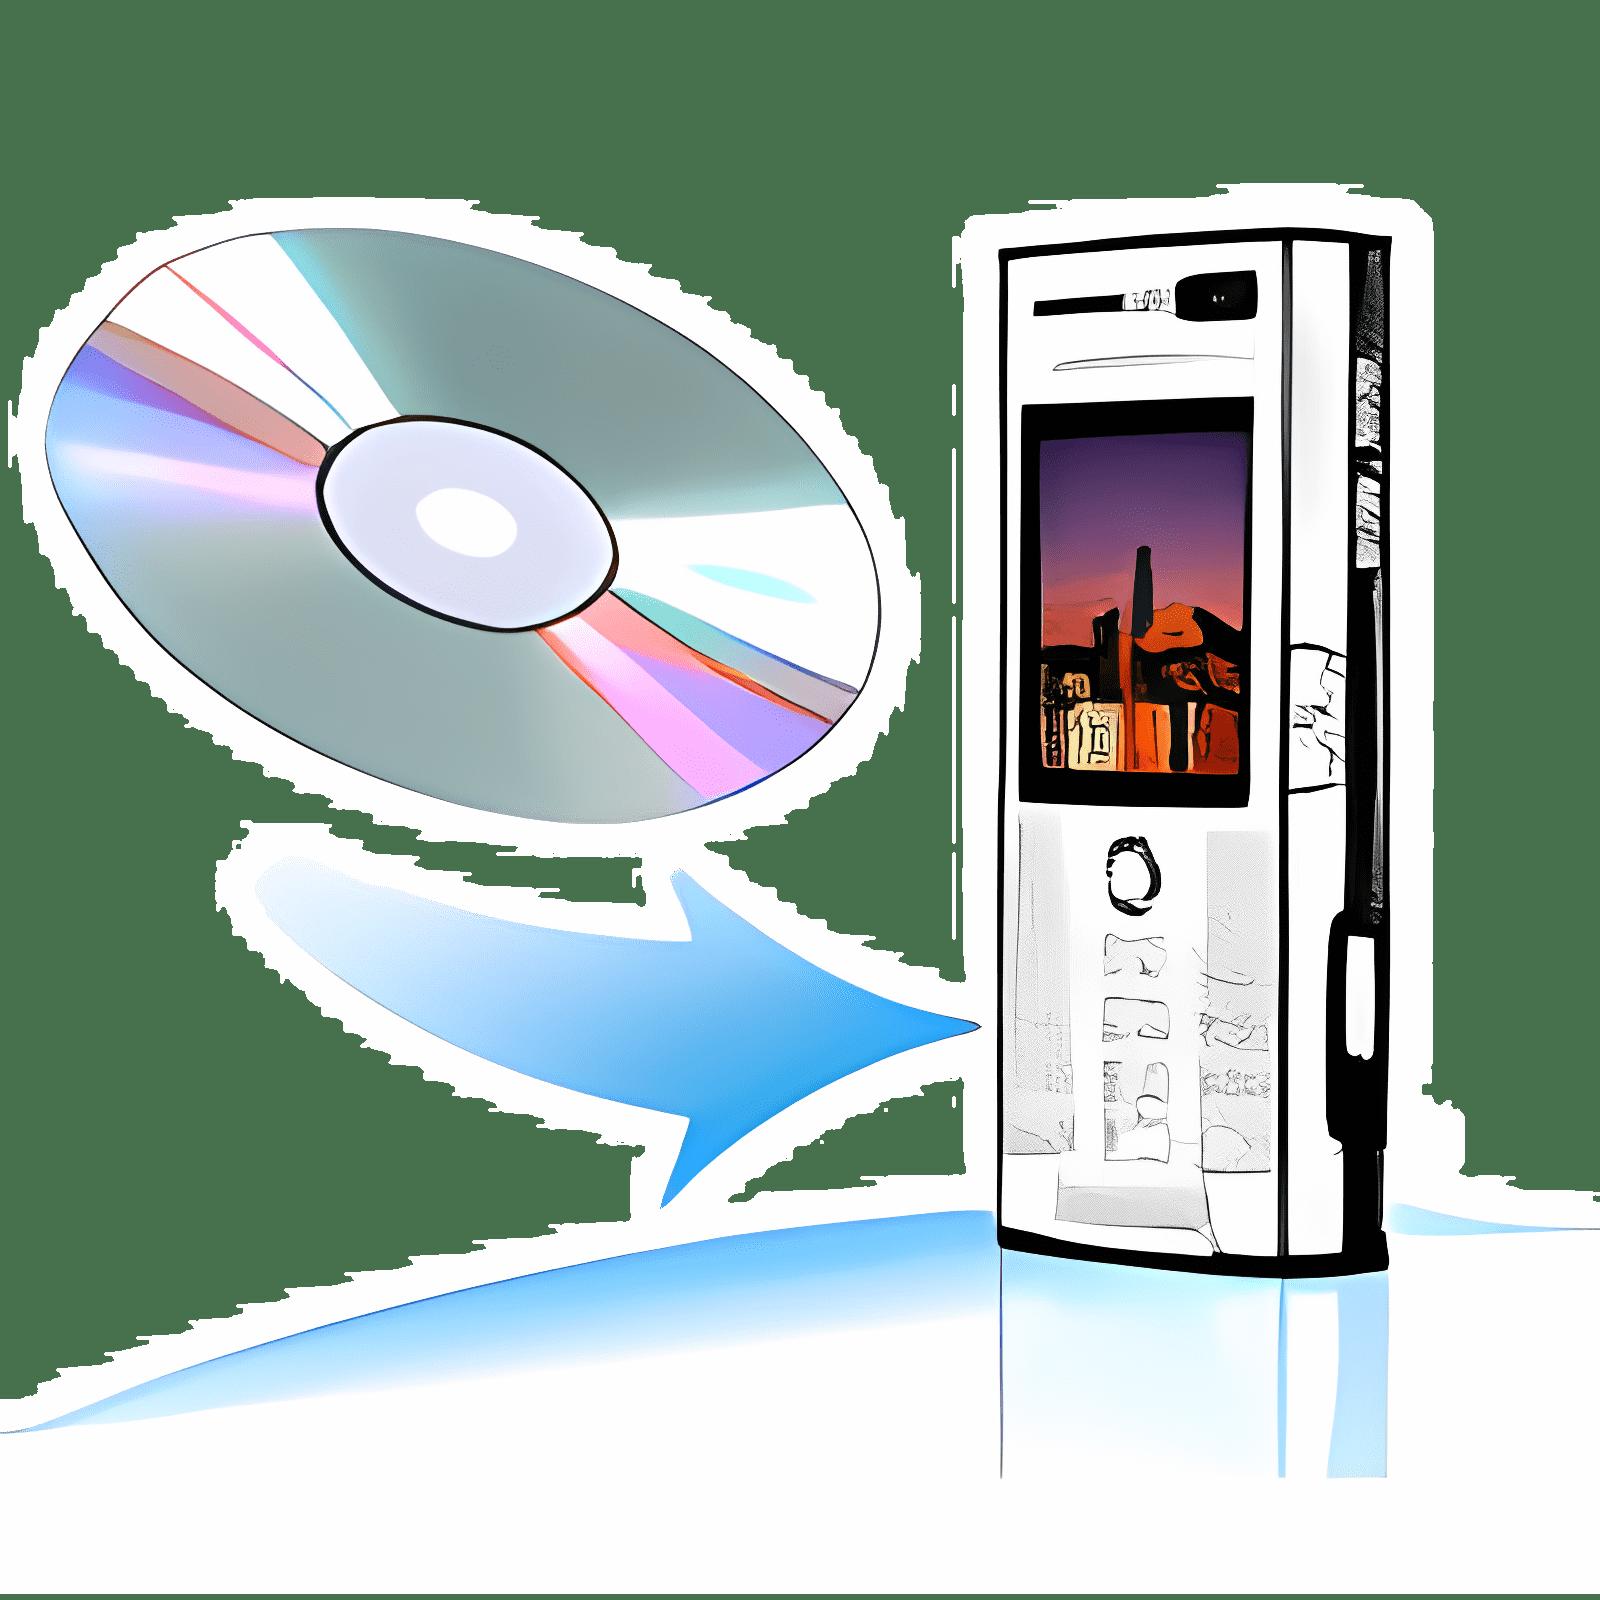 ImTOO 3GP Video Converter